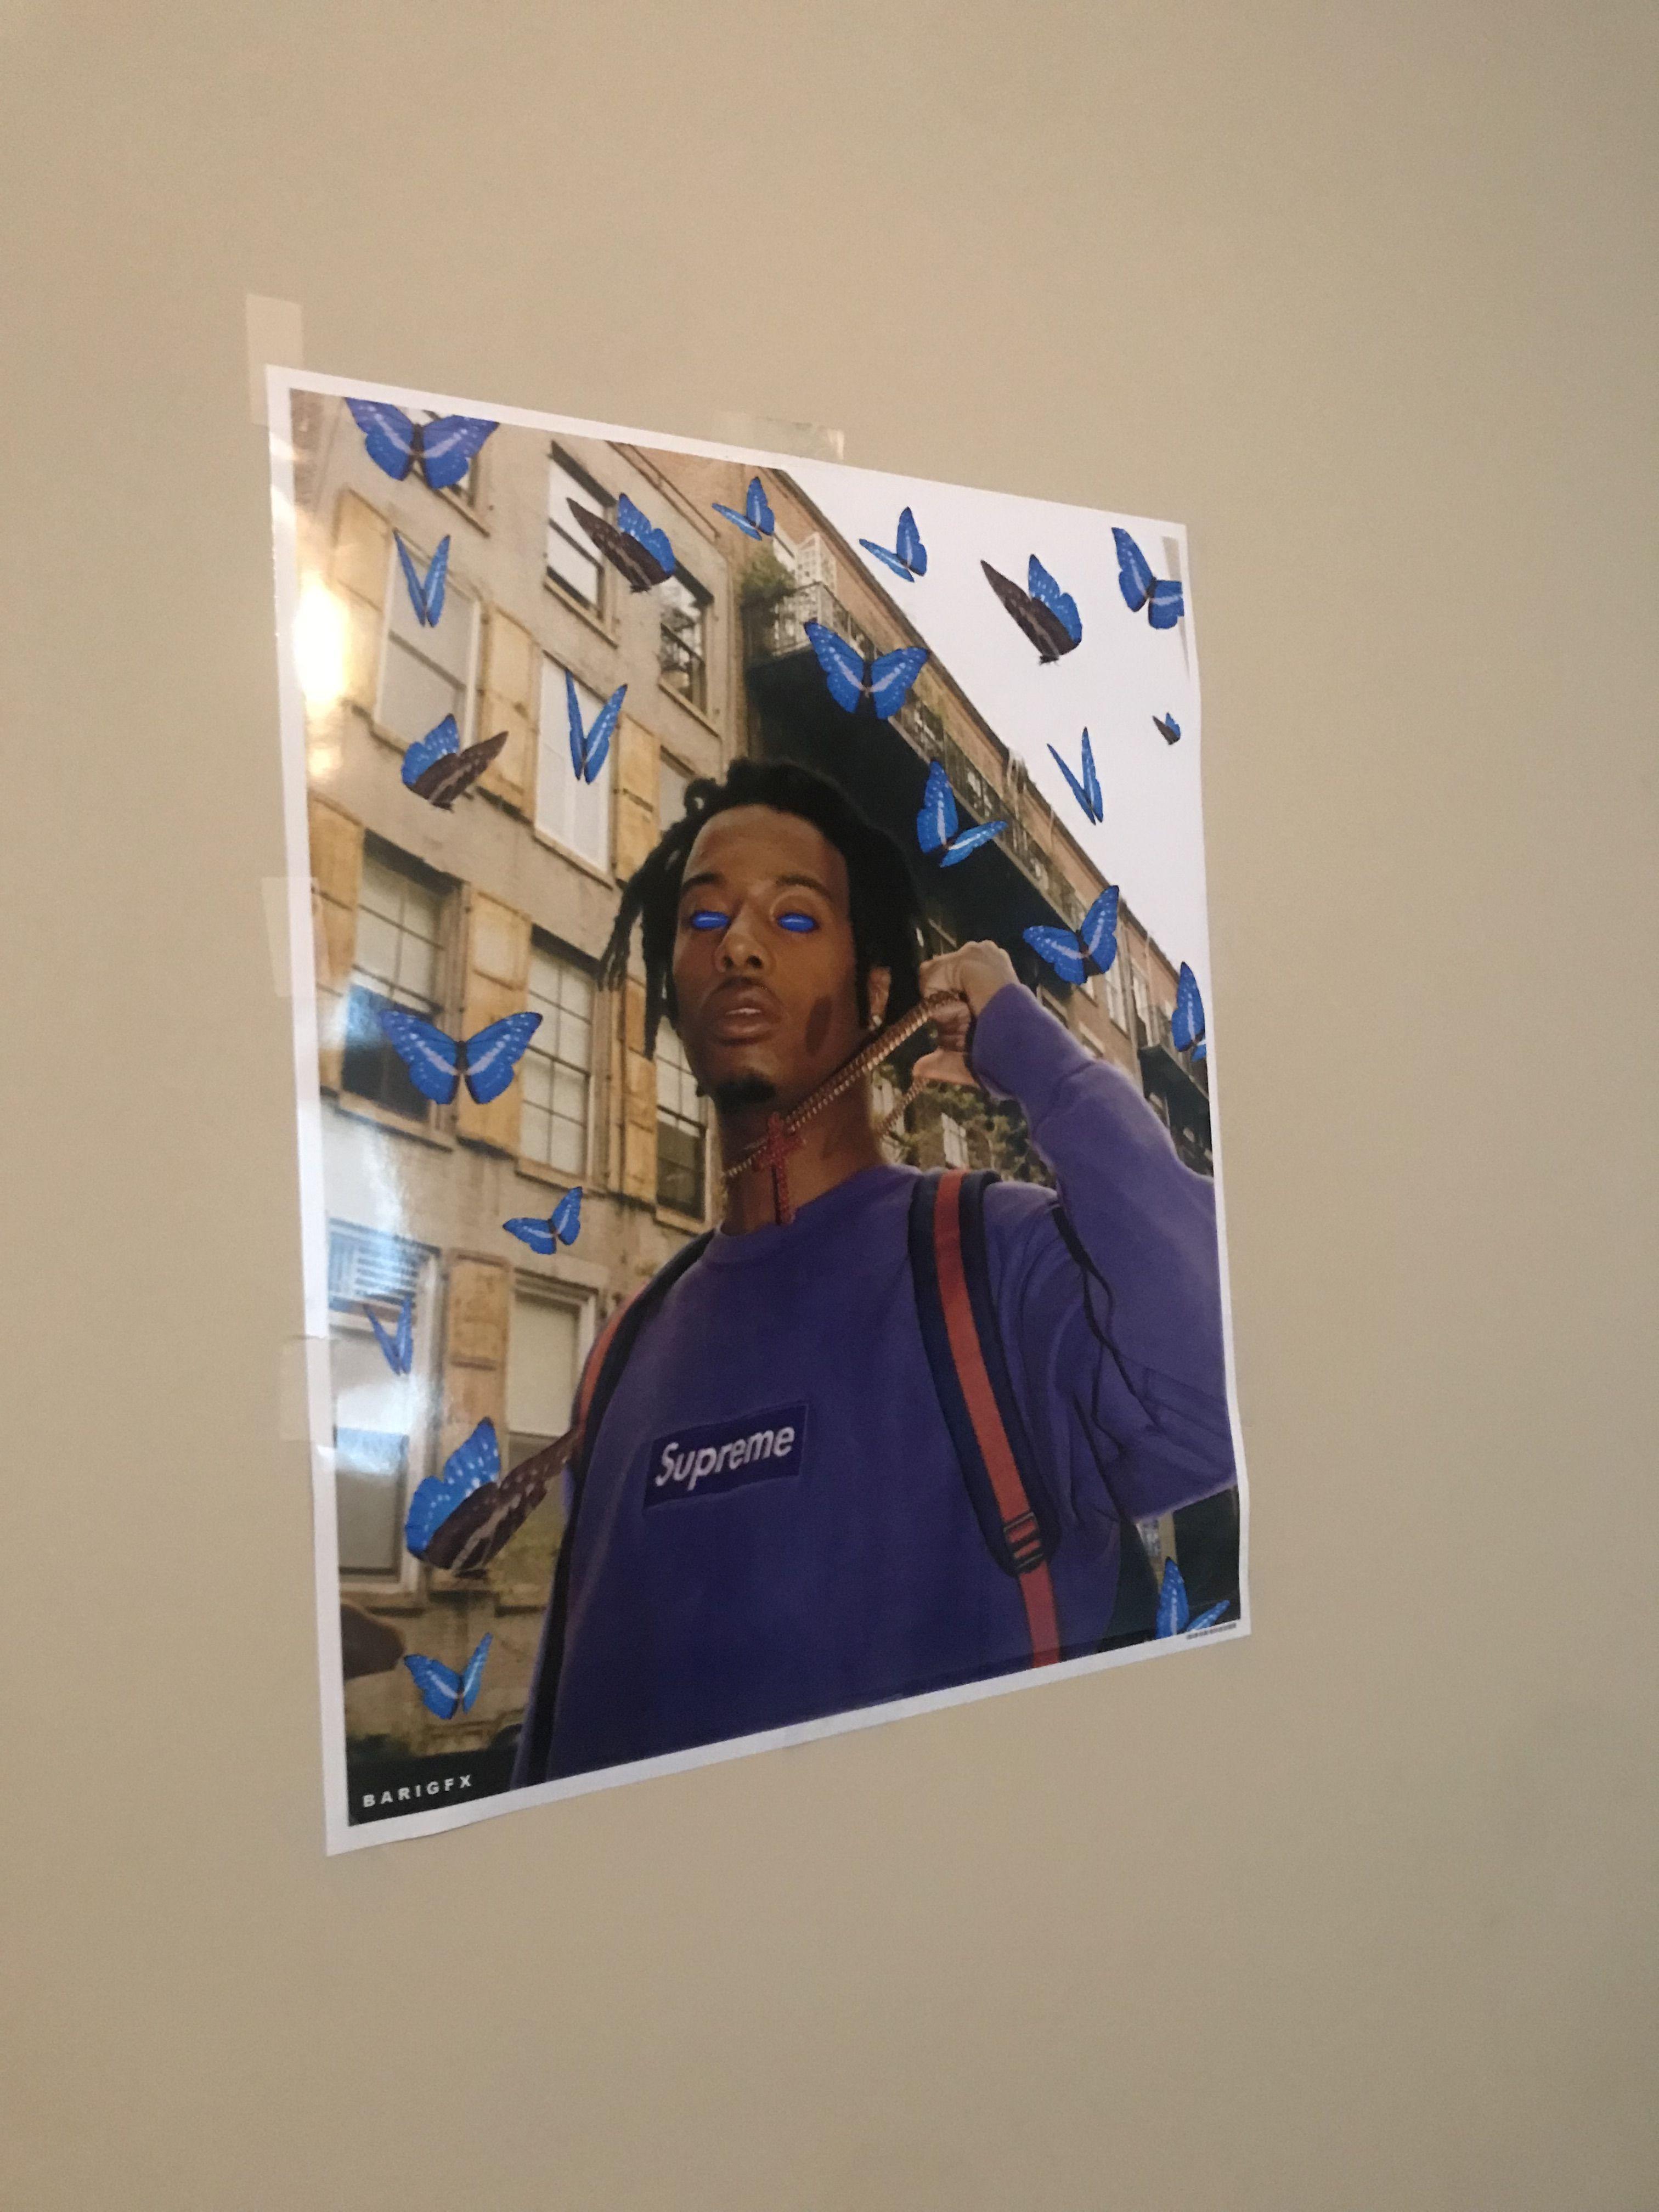 26515e9341c0 Playboi Carti Butterfly Poster by @barigfx #playboicarti #cashcarti #playboy  #butterfly #butterflies #dielit #vlone #poster #redbubble #playboi #carti  ...